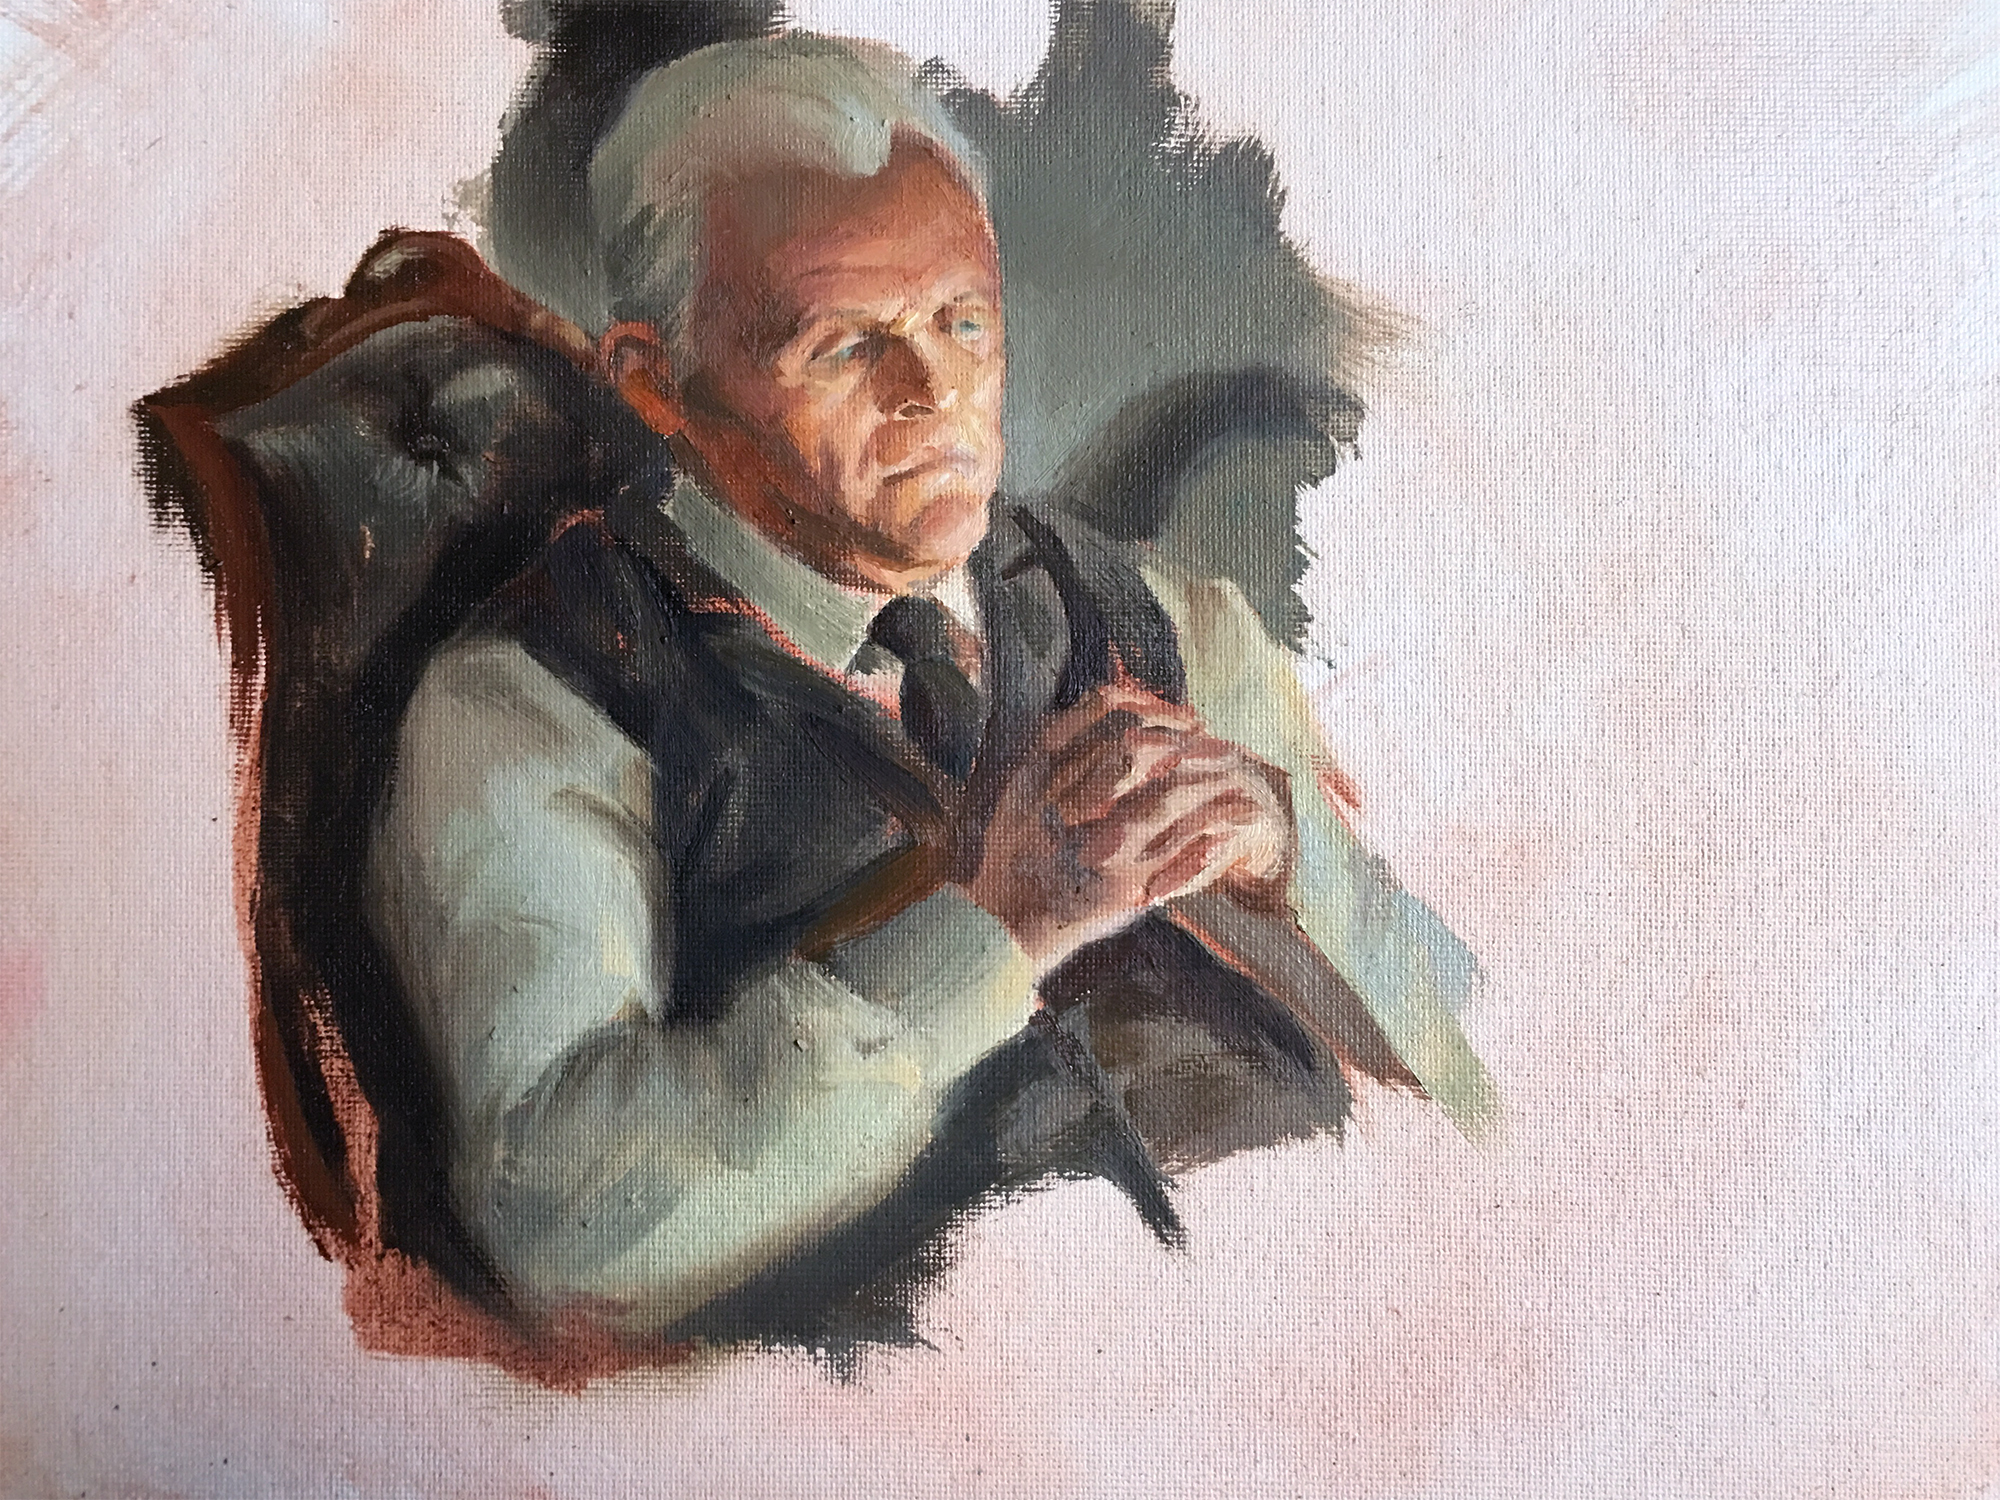 Westworld_Anthony_Hopkins_Painting_by_Jordan_Lamarre-Wan_2.jpg